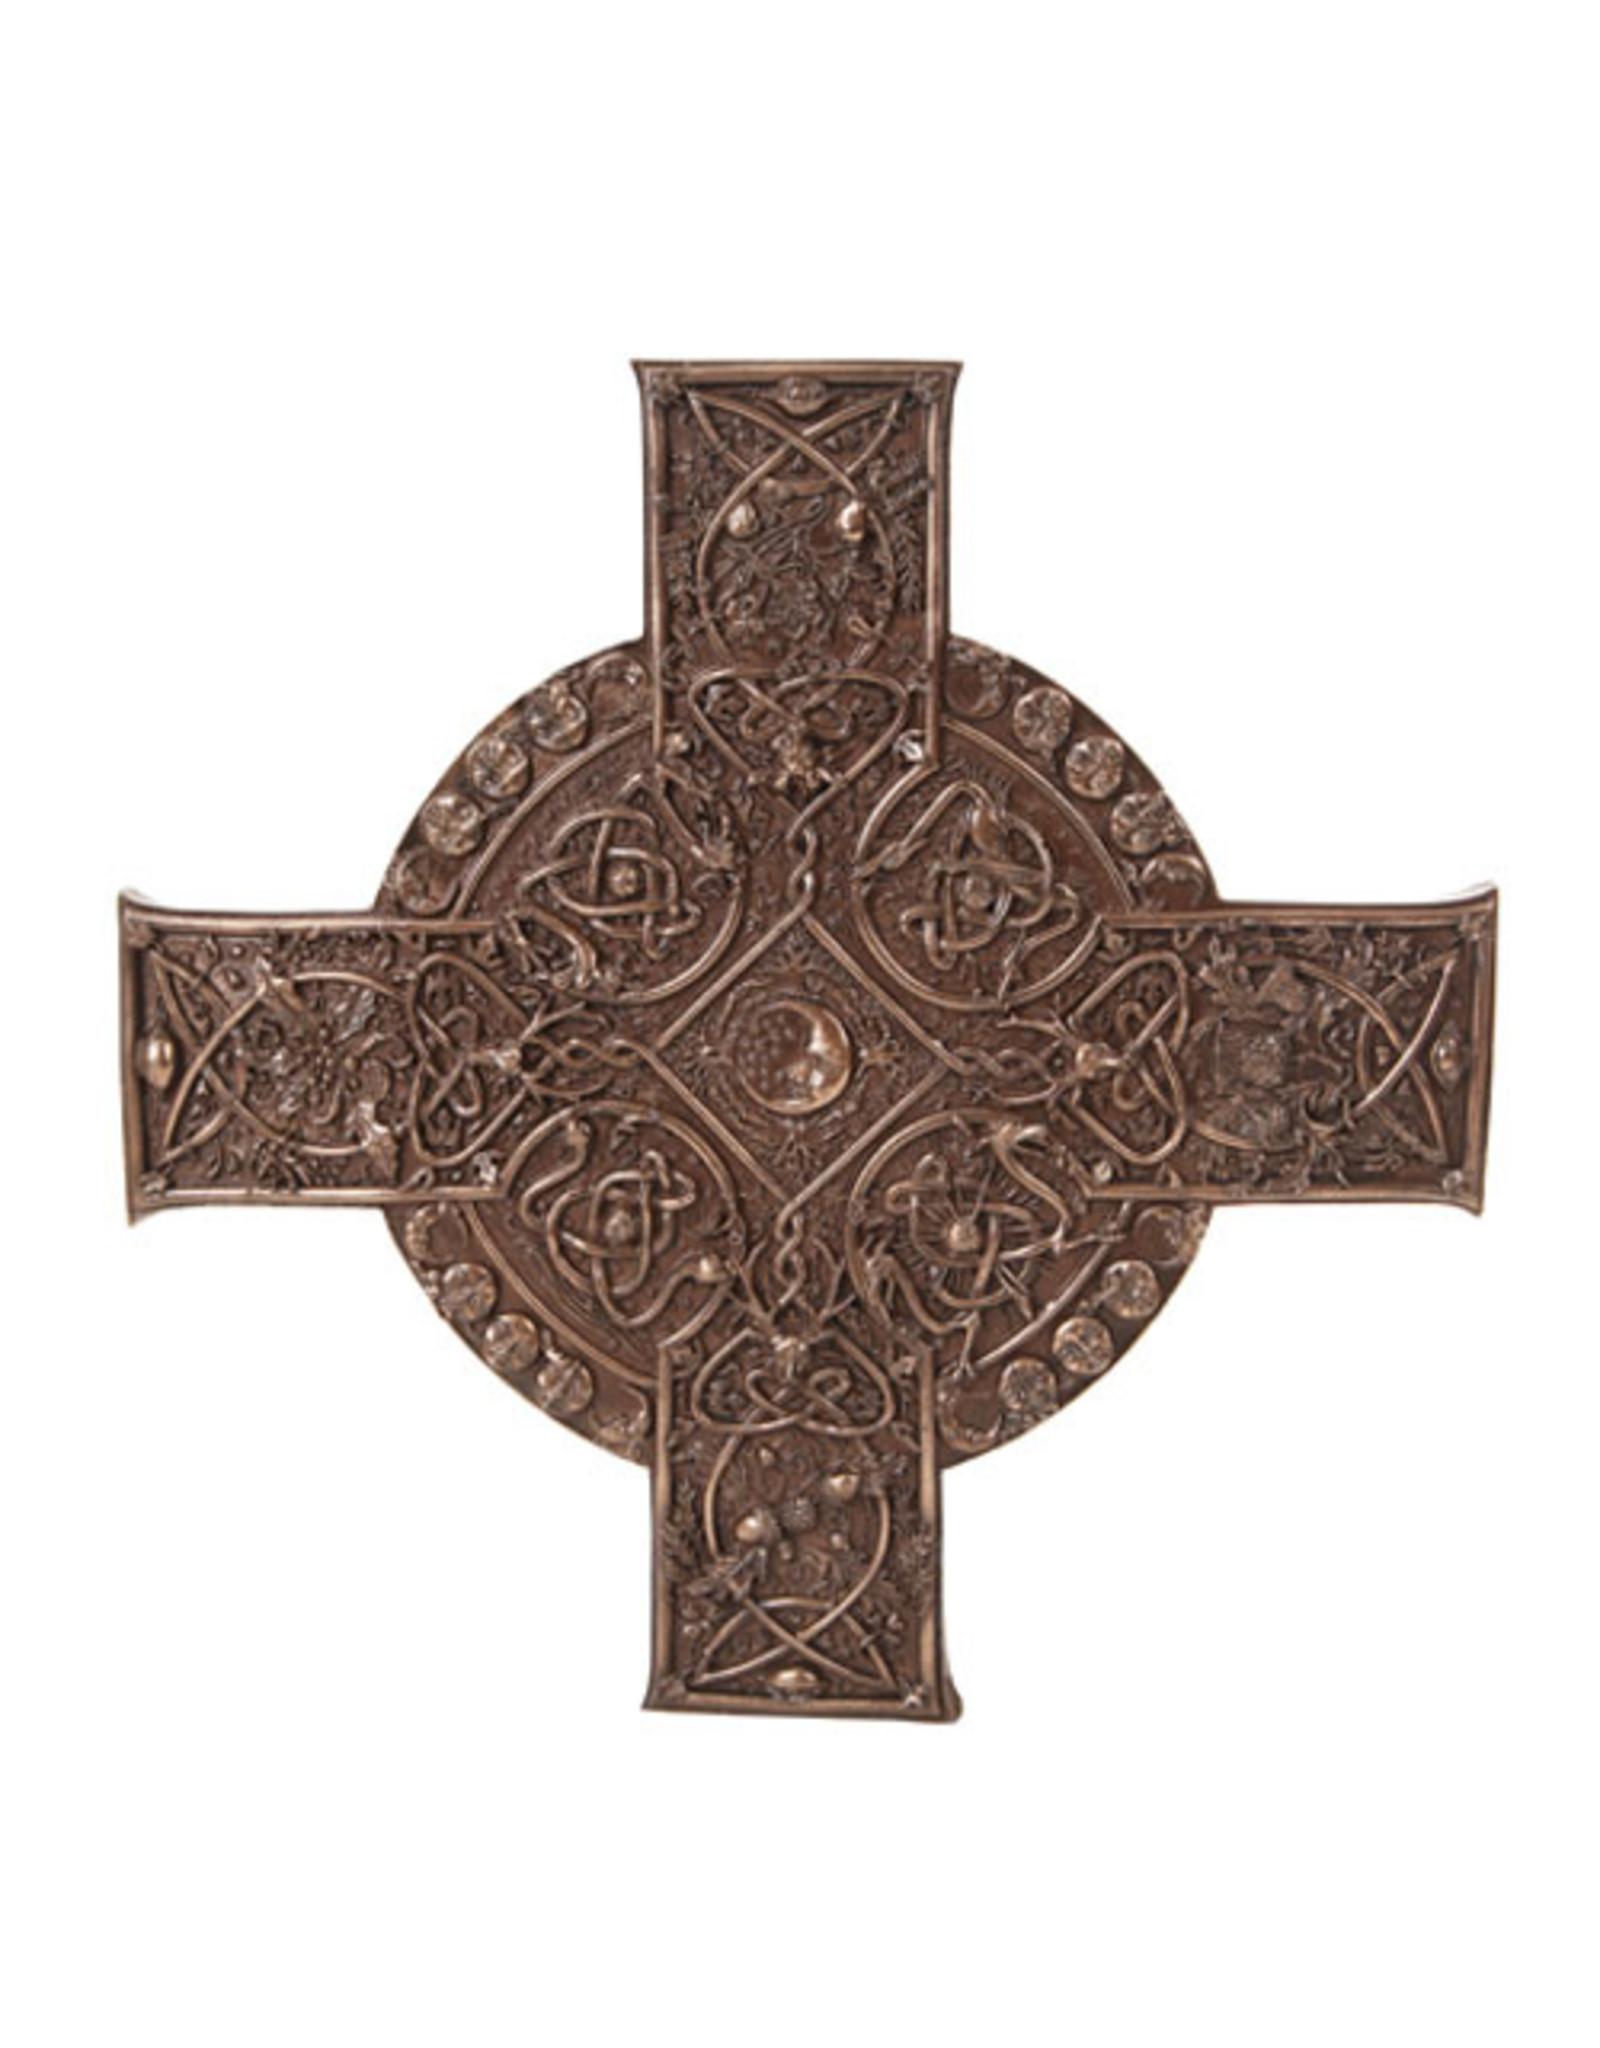 Elemental Celtic Cross Plaque in Cold Cast Bronze